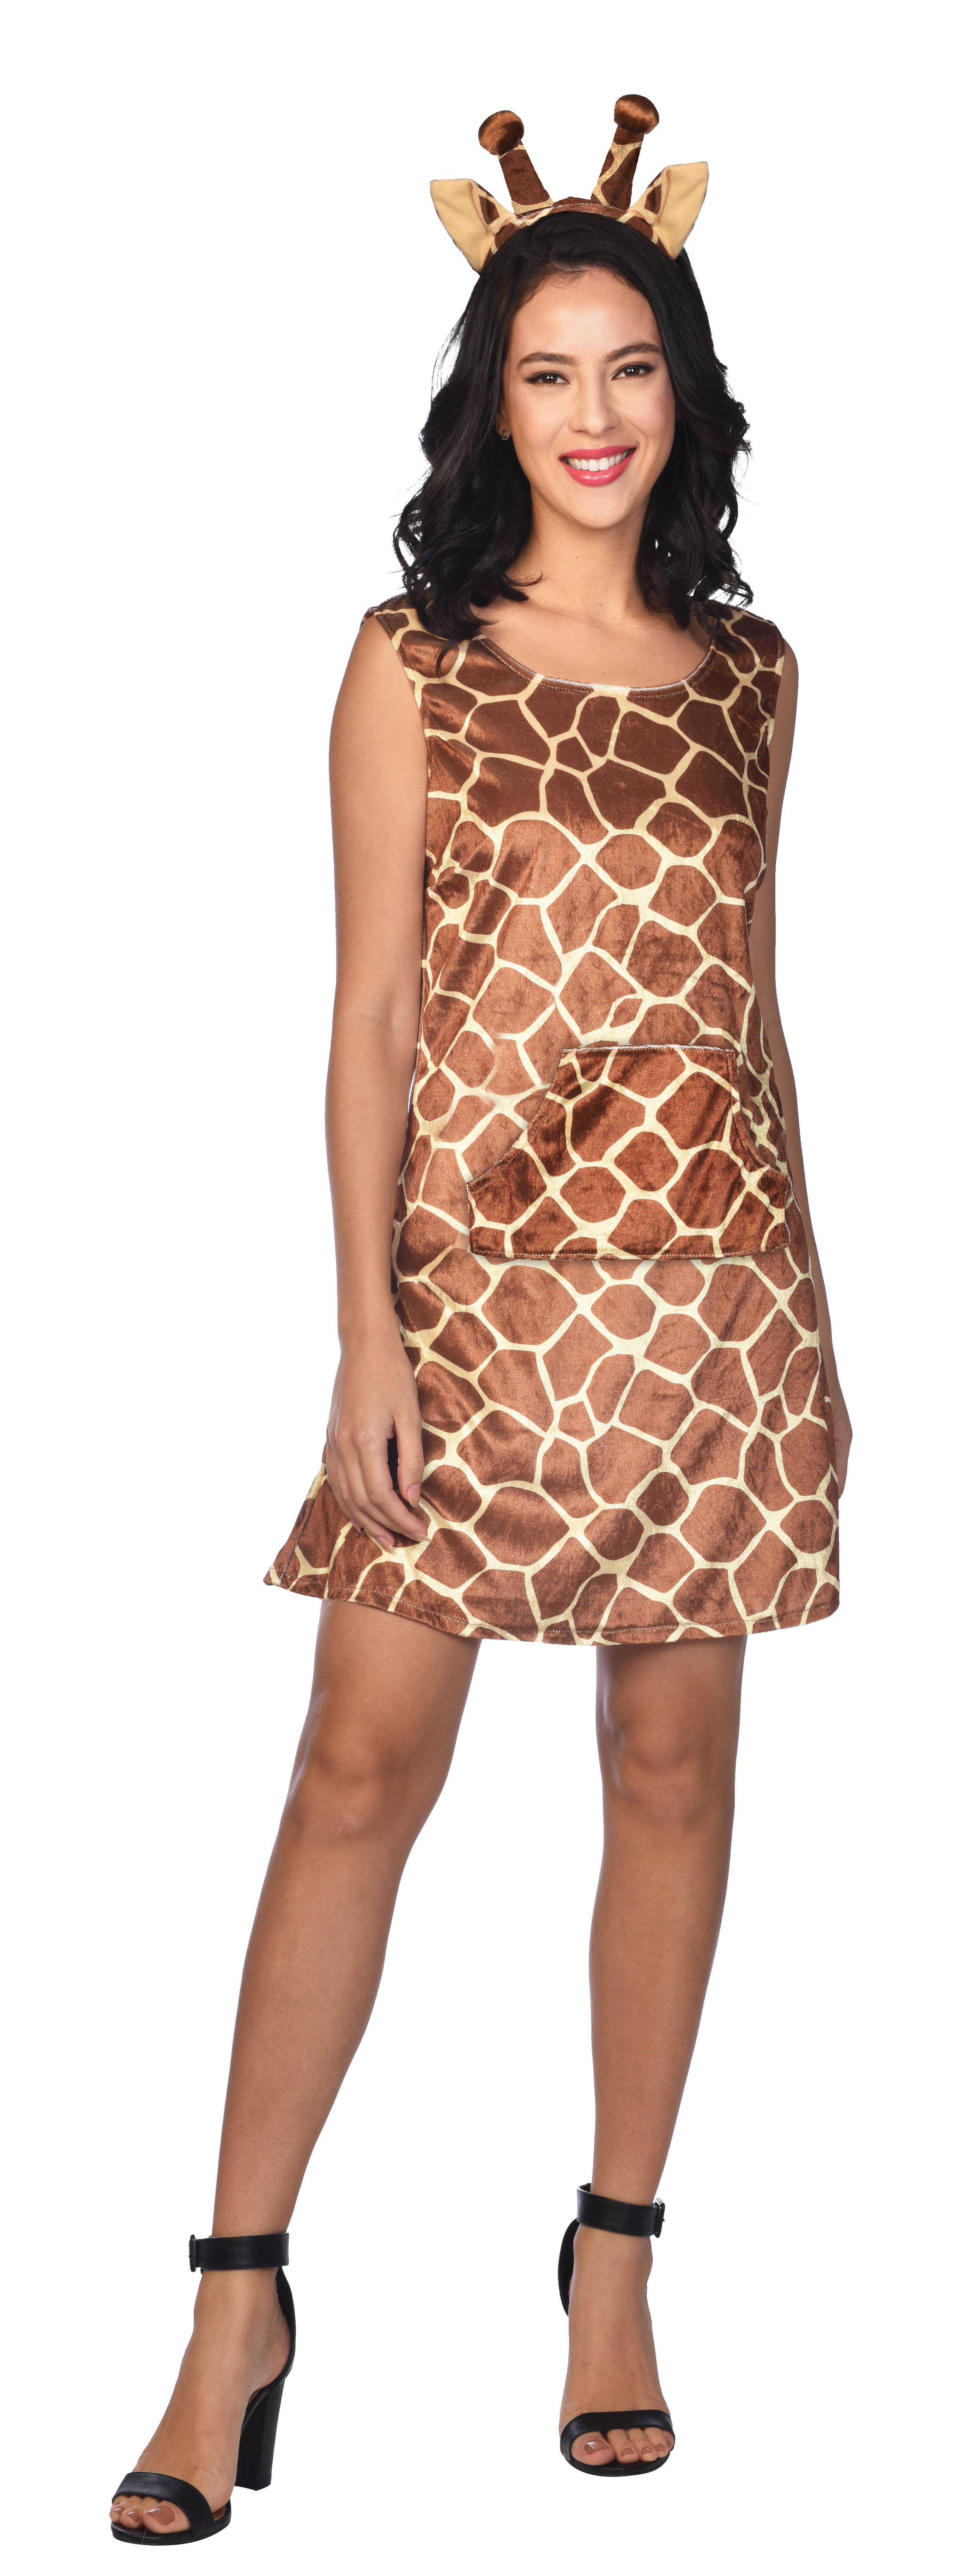 Indexbild 26 - Adult Ladies Zoo Safari Animal Giraffe Lady Fancy Dress Costume Womens Outfit